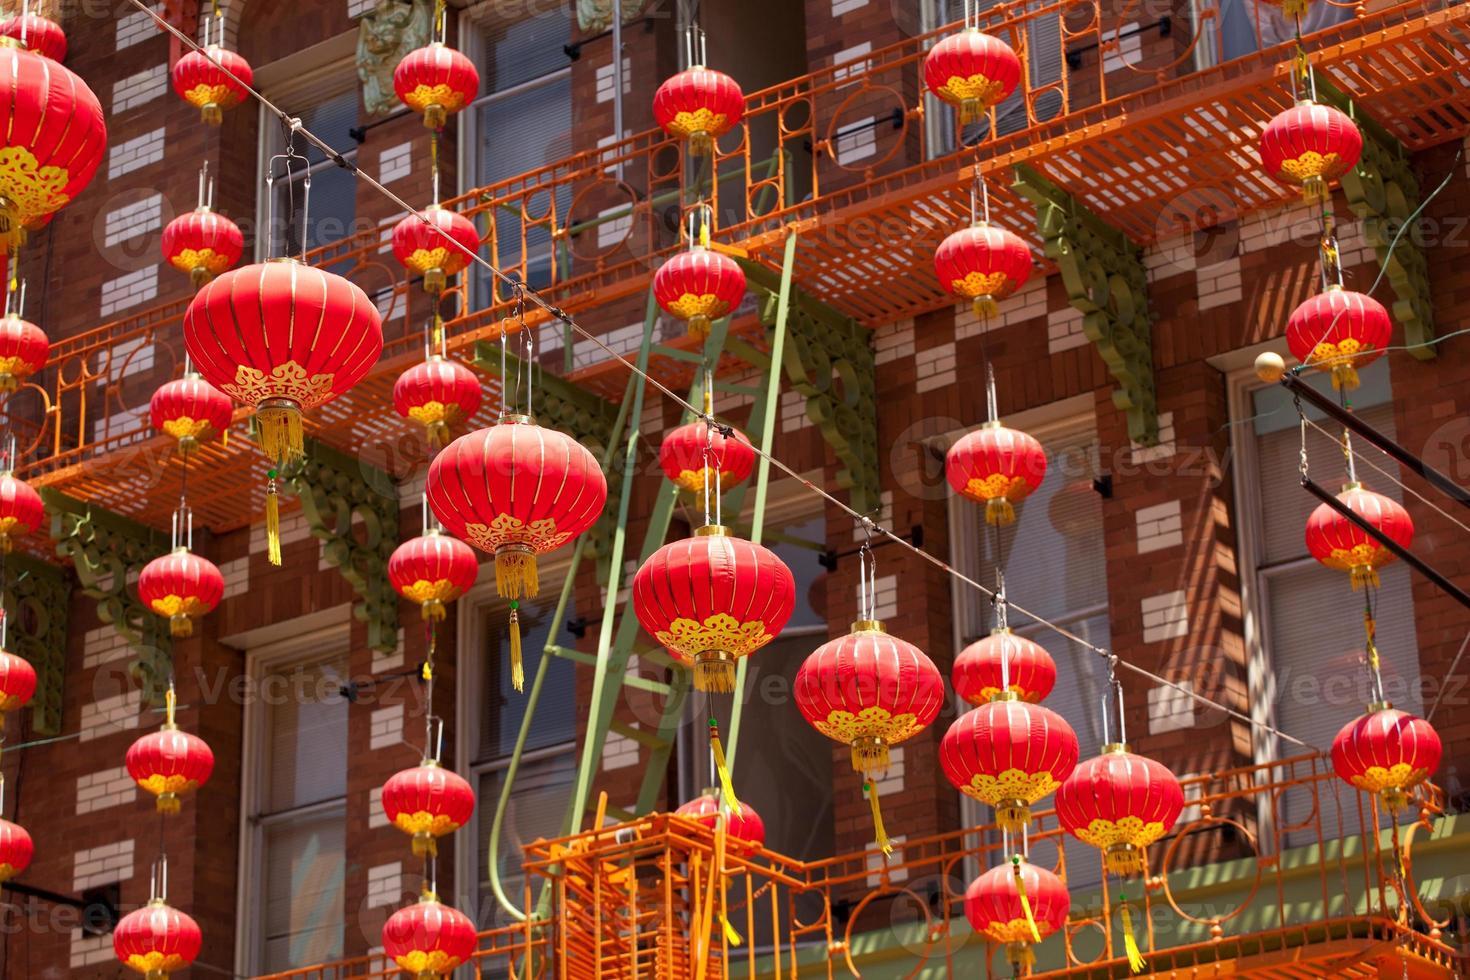 Red lanterns hanging in Chinatown photo